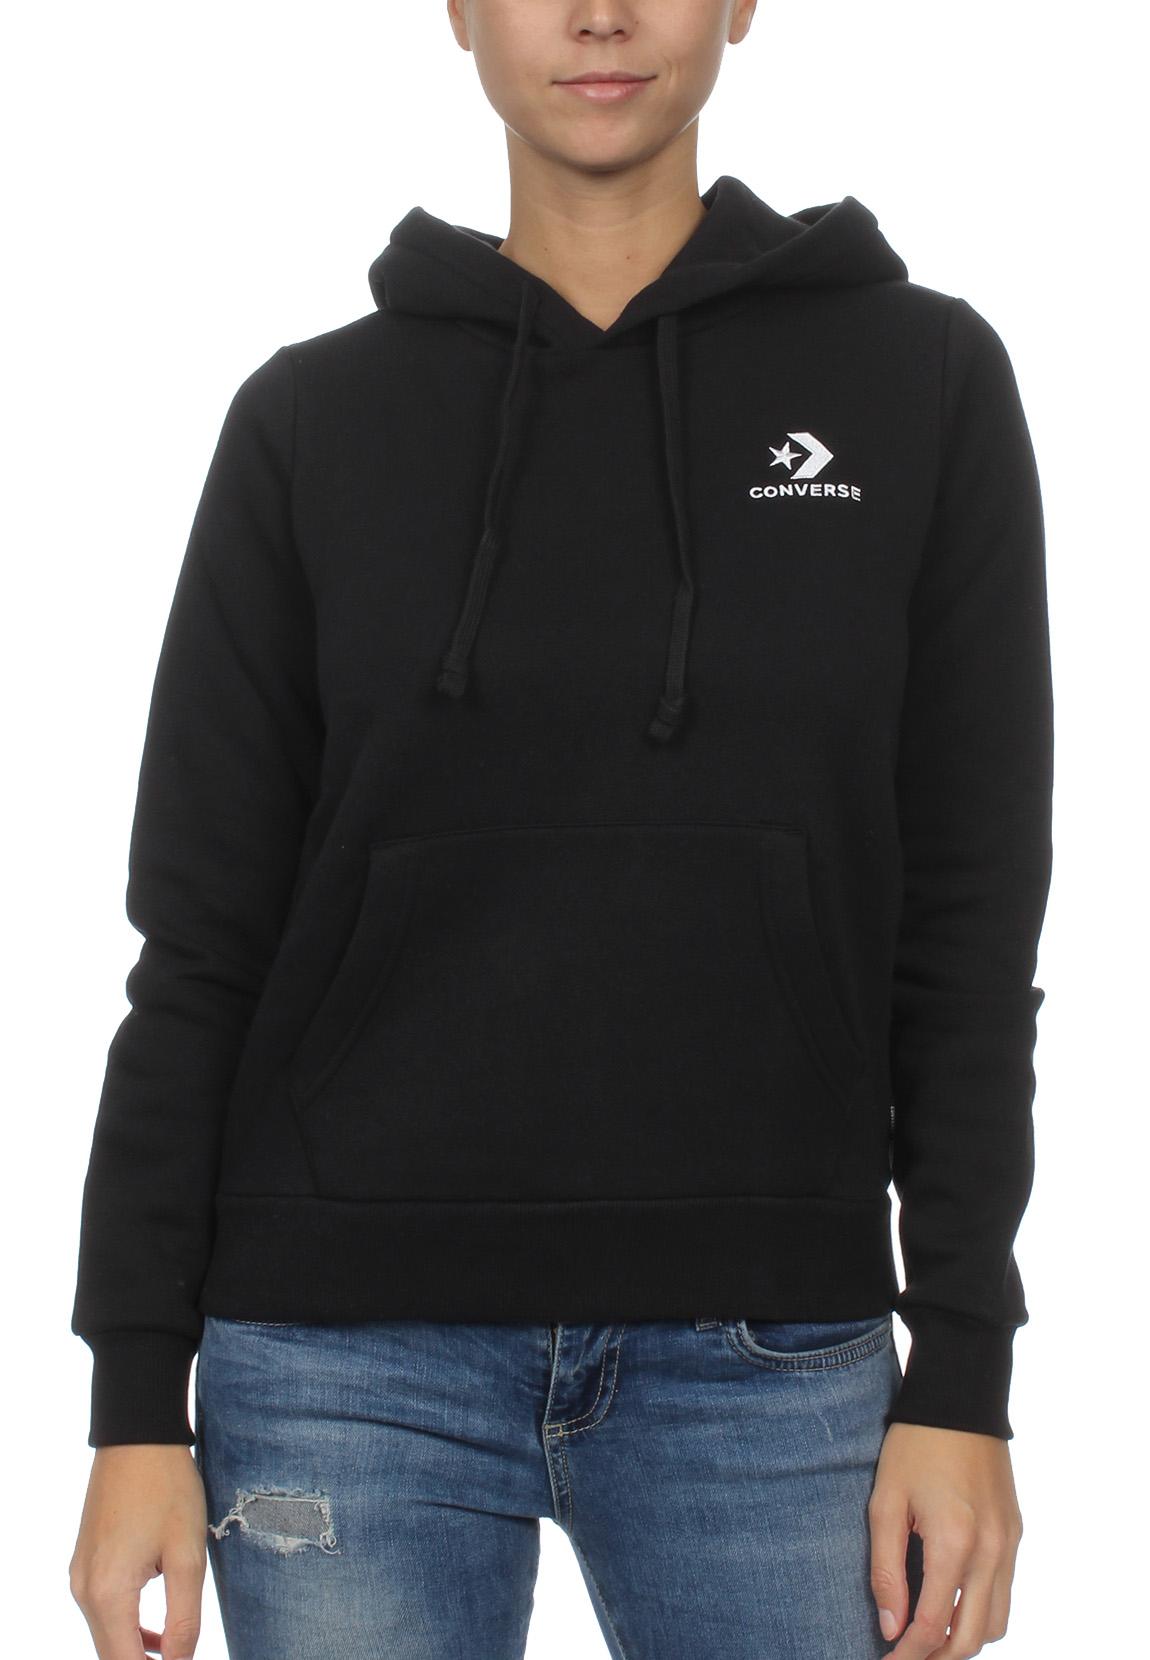 7549428602b82 Details about Converse Sweater Ladies Star Chevron Po Hoodie 10008819 Black  001